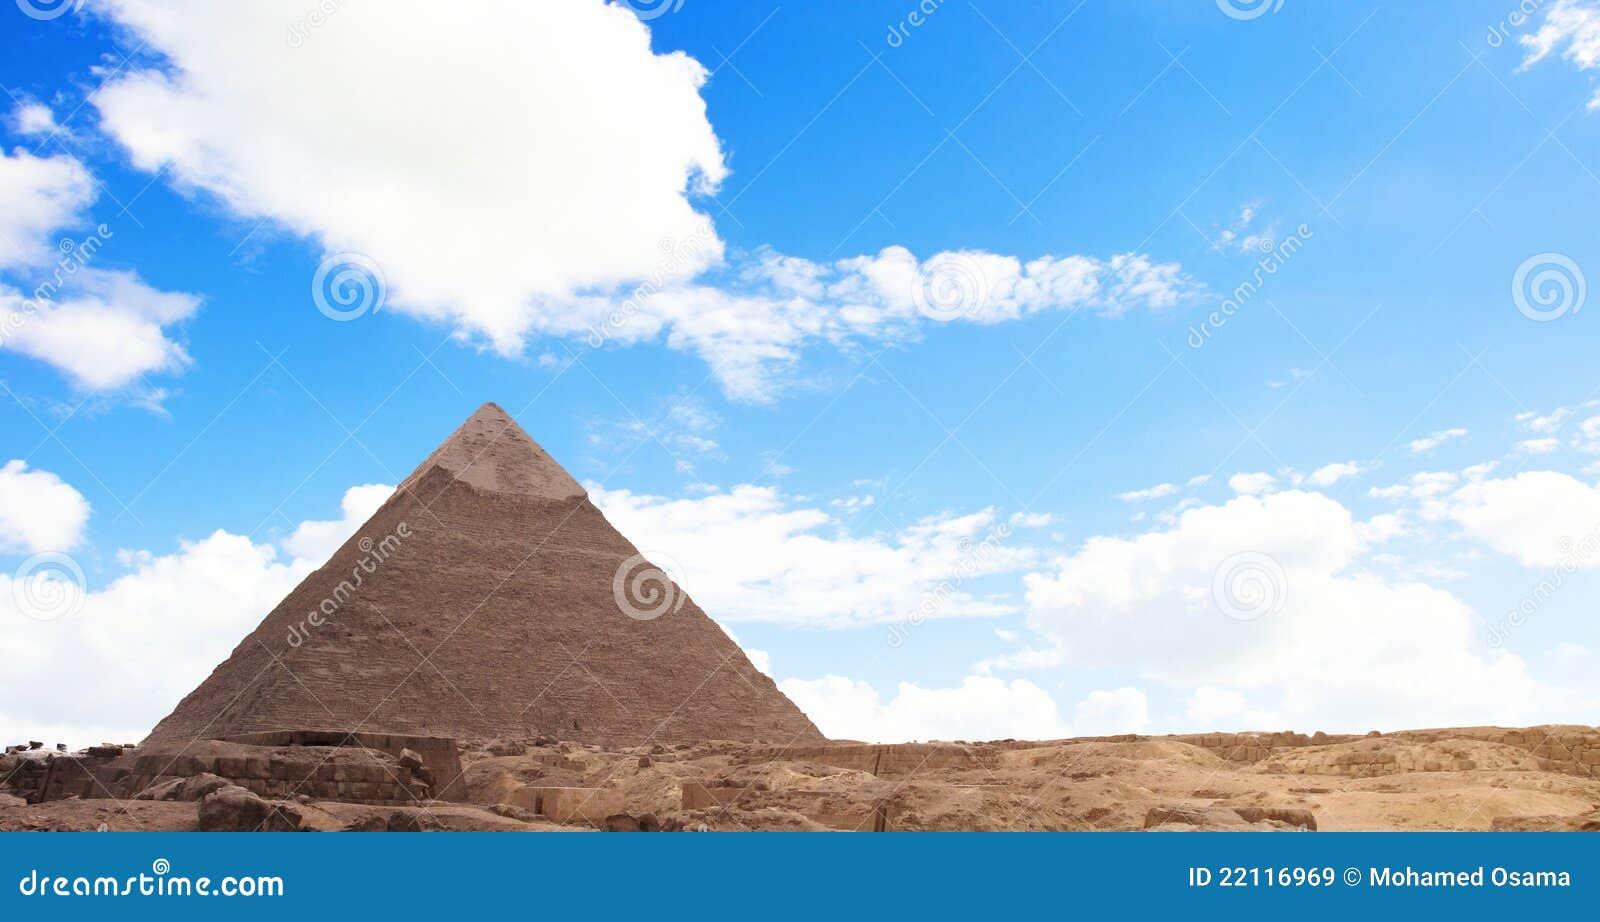 egipt sky